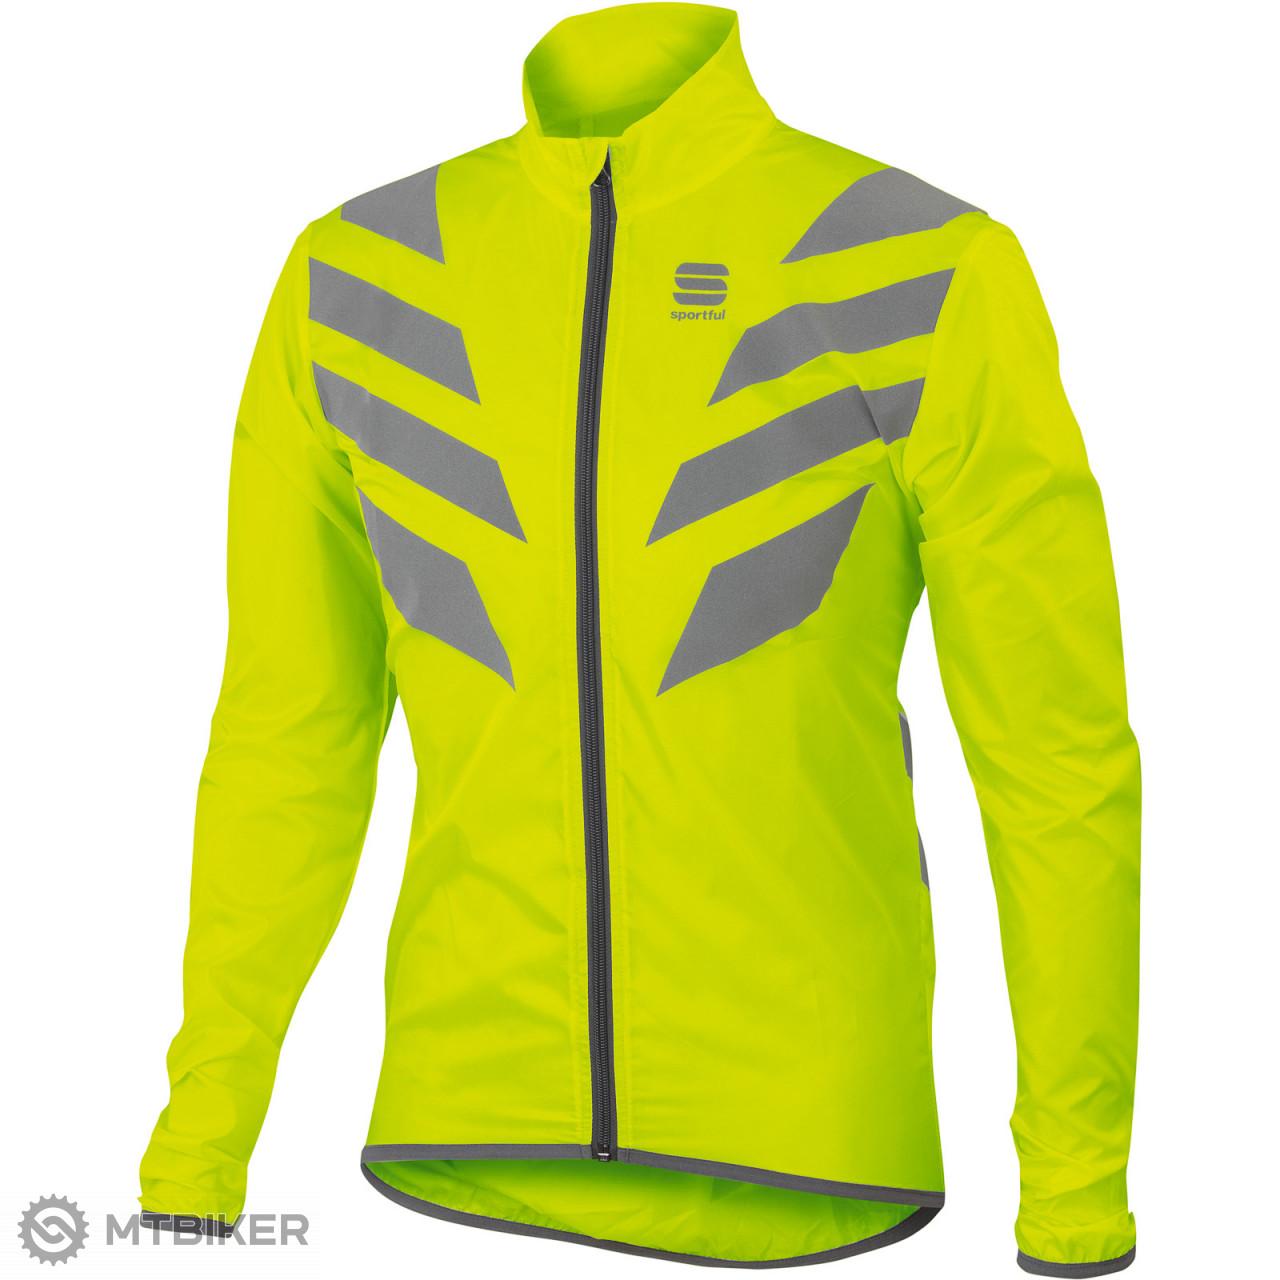 098c667b53a0a Sportful Reflex bunda fluo žltá - MTBIKER Shop